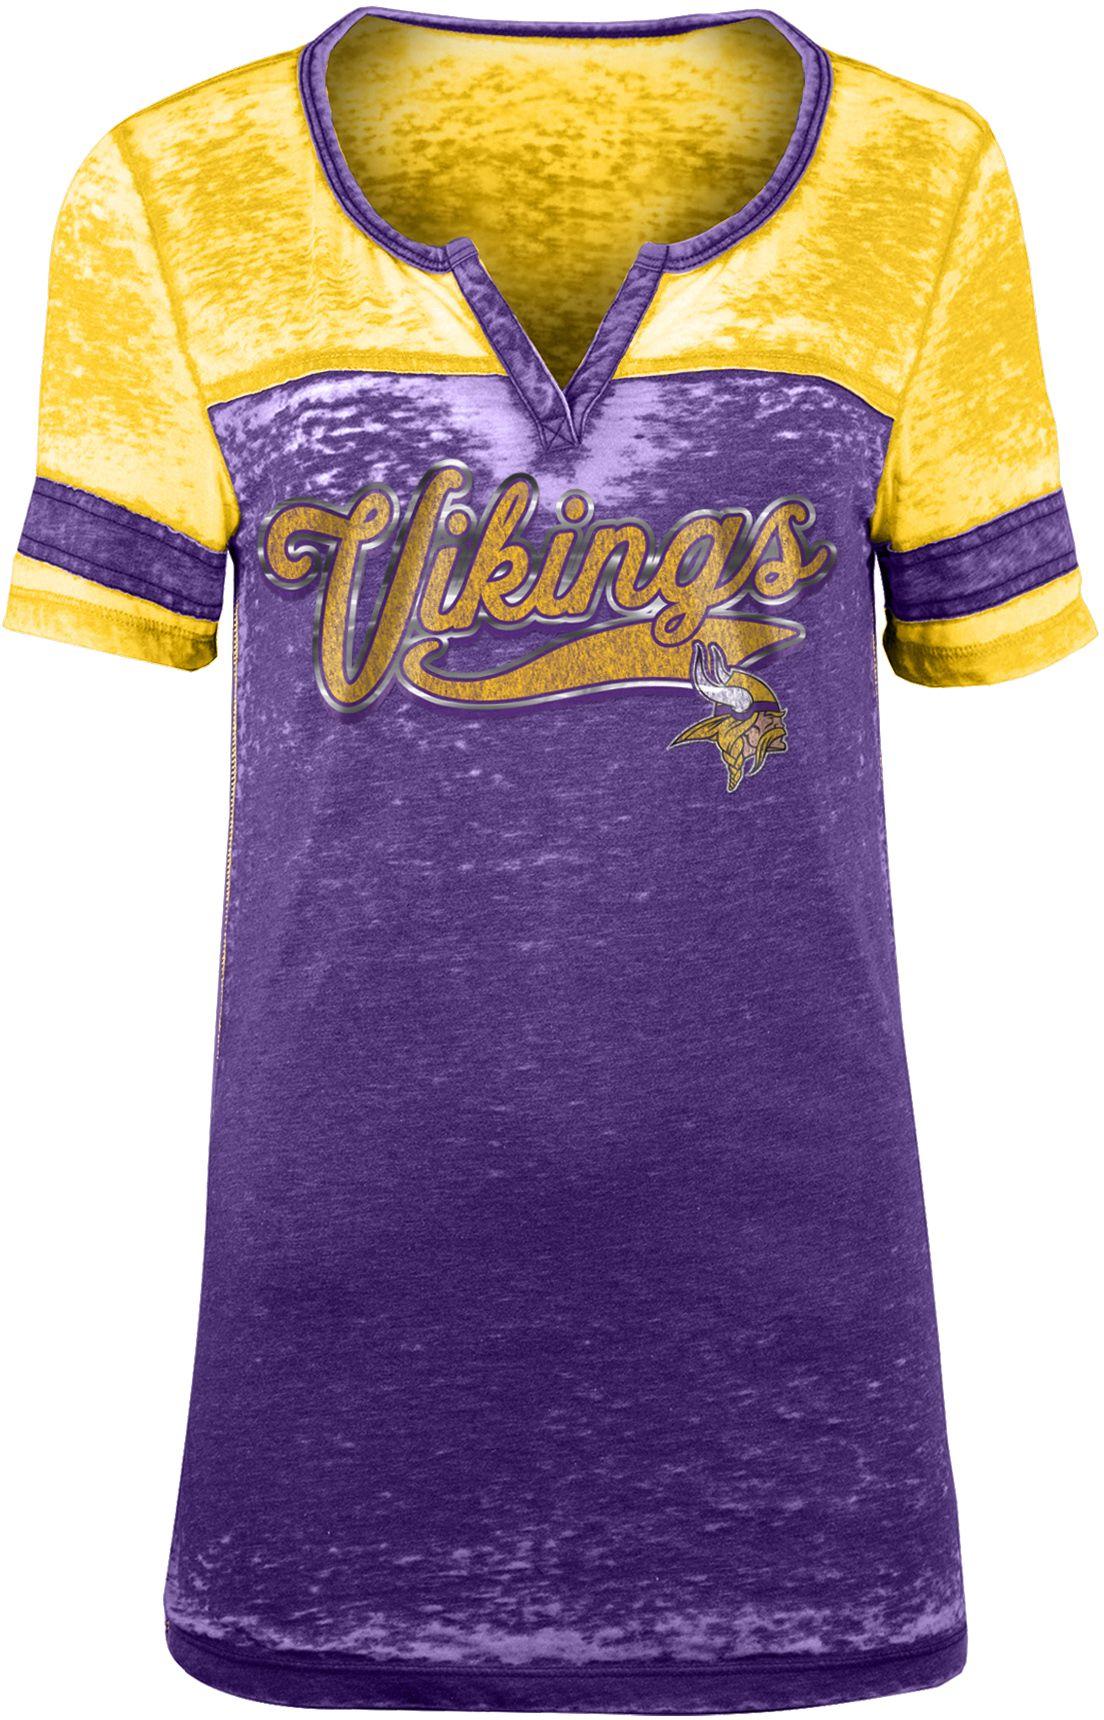 wholesale dealer 111ac c5378 cheap minnesota vikings apparel